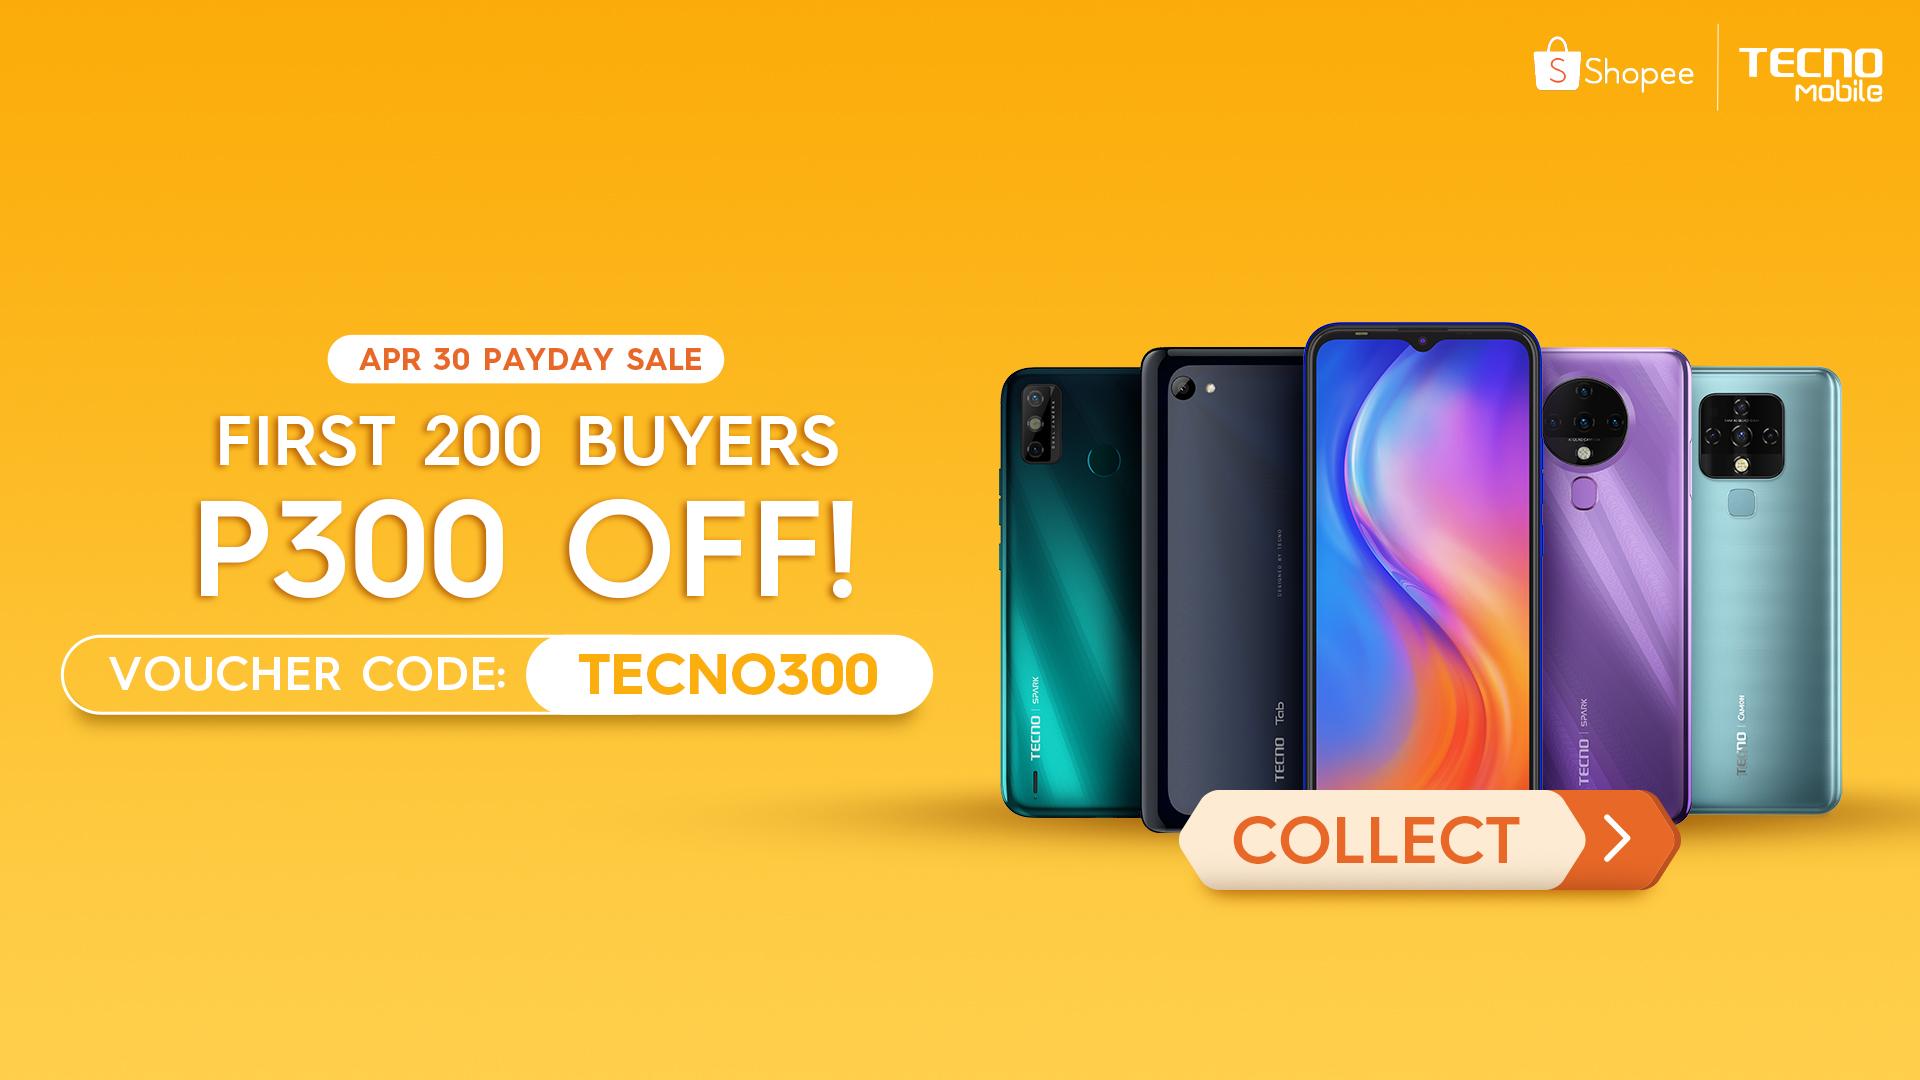 tecno-smartphones-go-on-sale-see-voucher-code-and-discounts